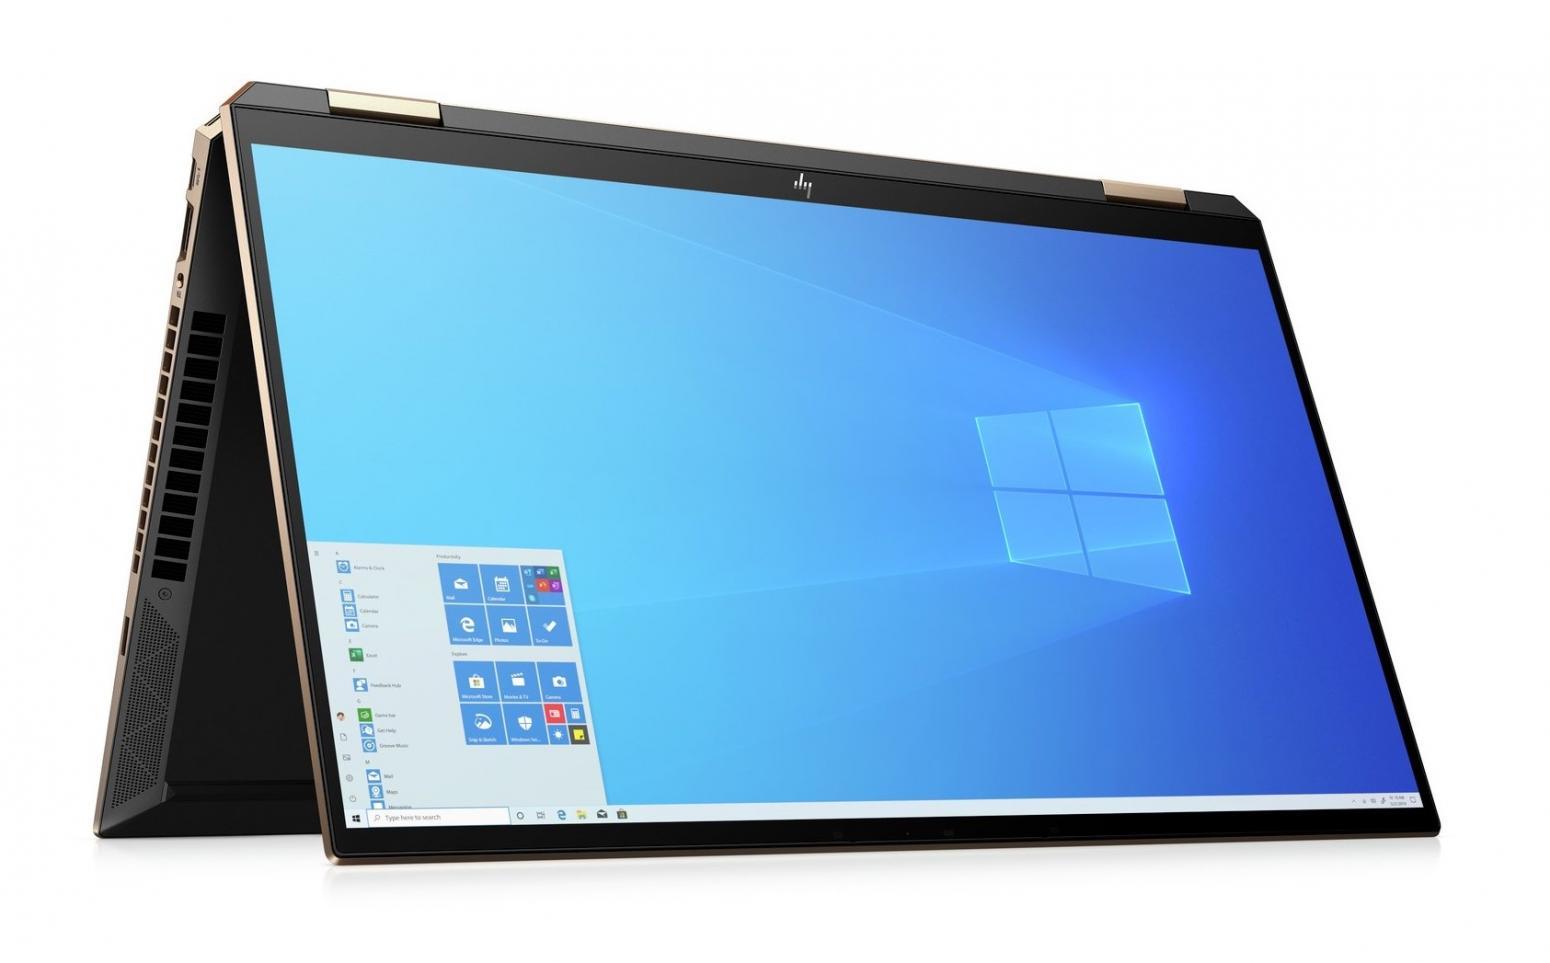 Image du PC portable HP Spectre x360 15-eb0013nf Noir - Tactile 4K OLED, GTX 1650 Ti Max-Q